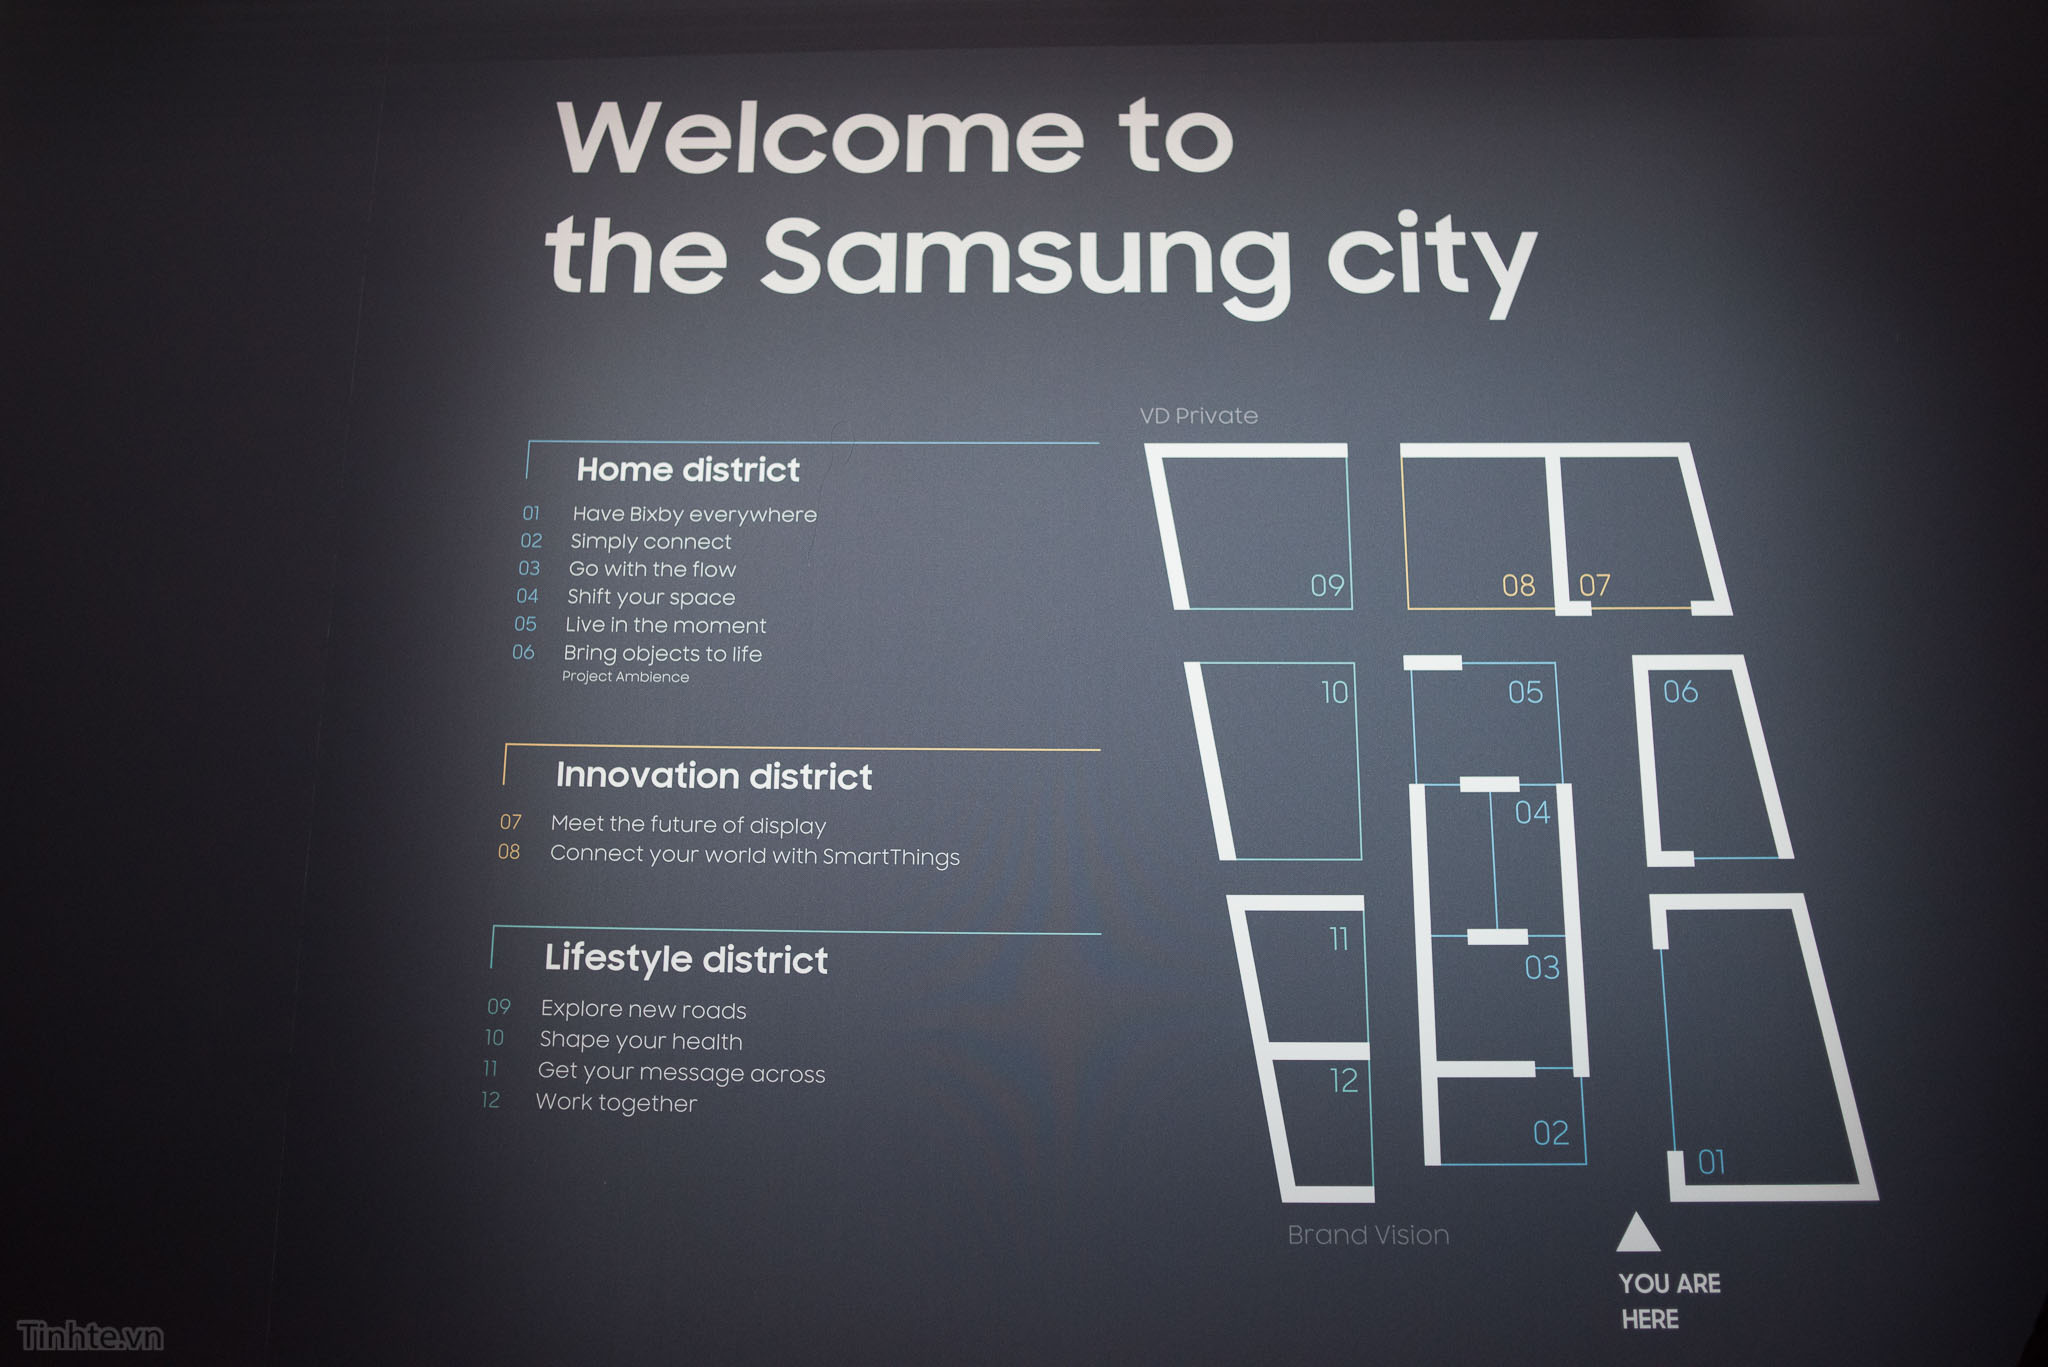 Samsung_TV_Tinhte.vn_CES_2018-3.jpg